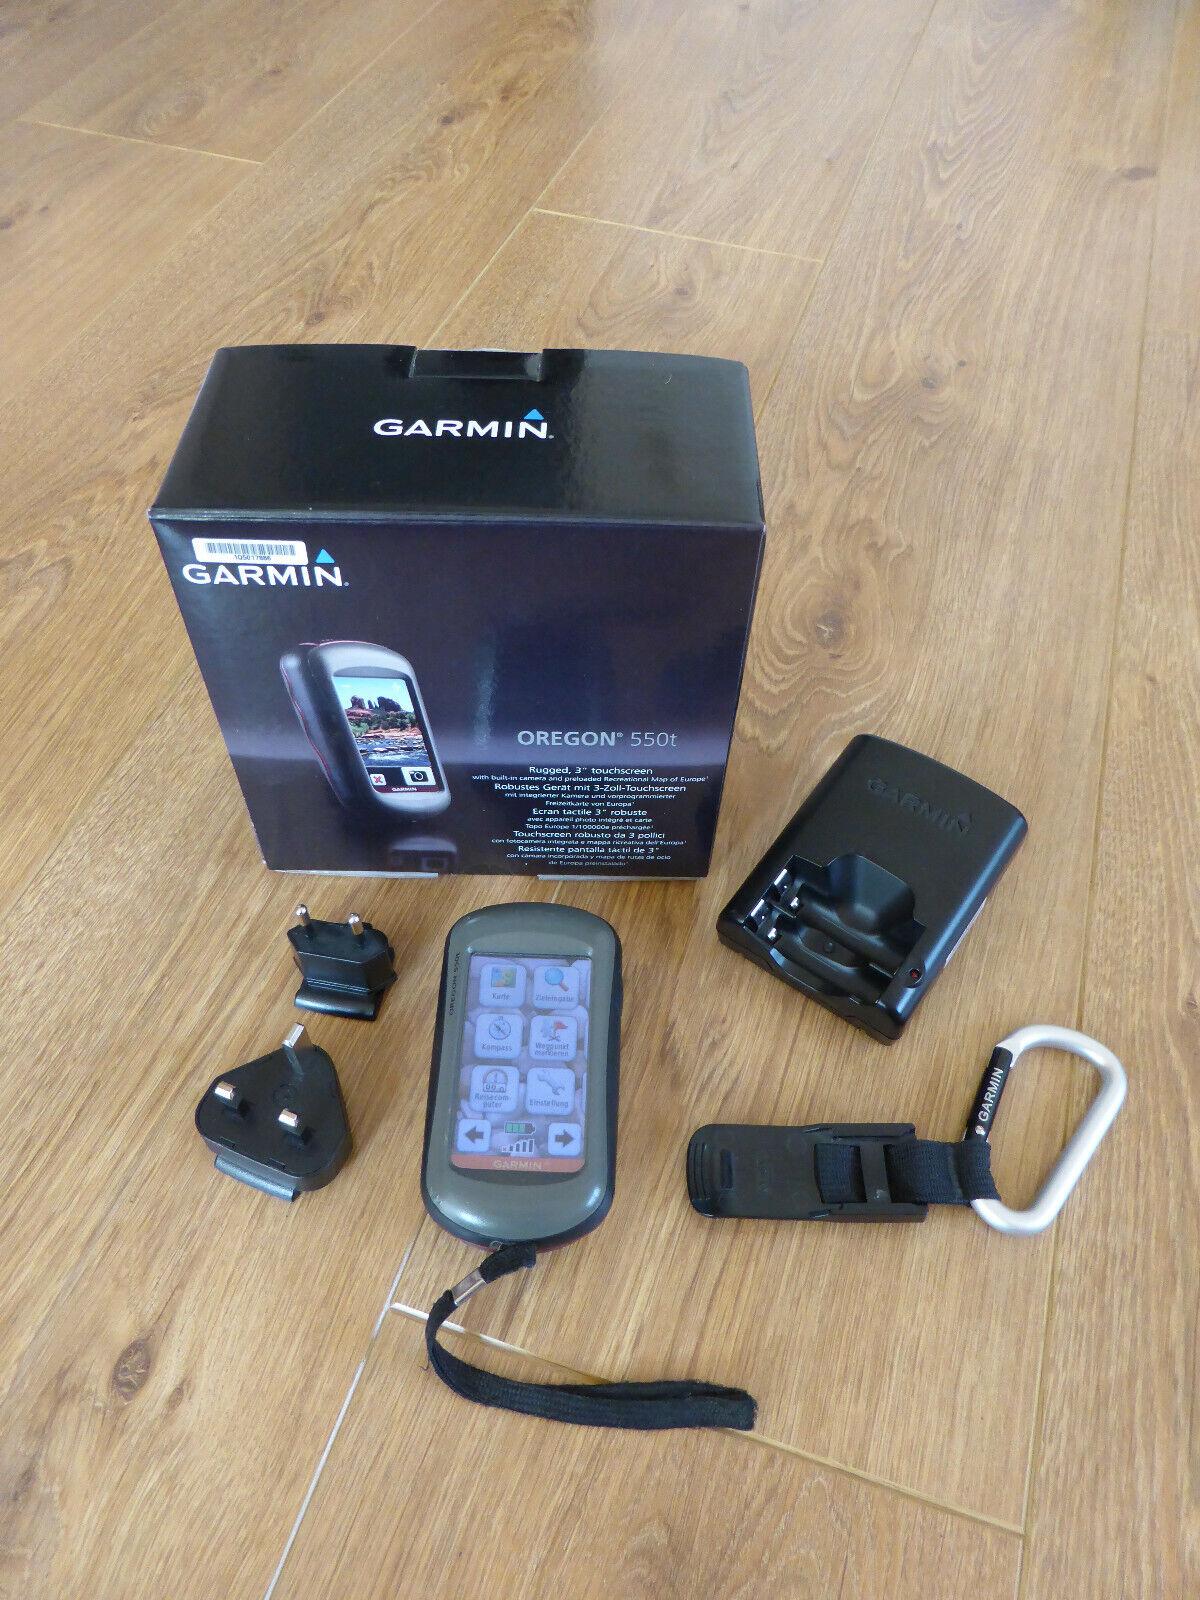 Garmin Oregon 550t GPS Gerät